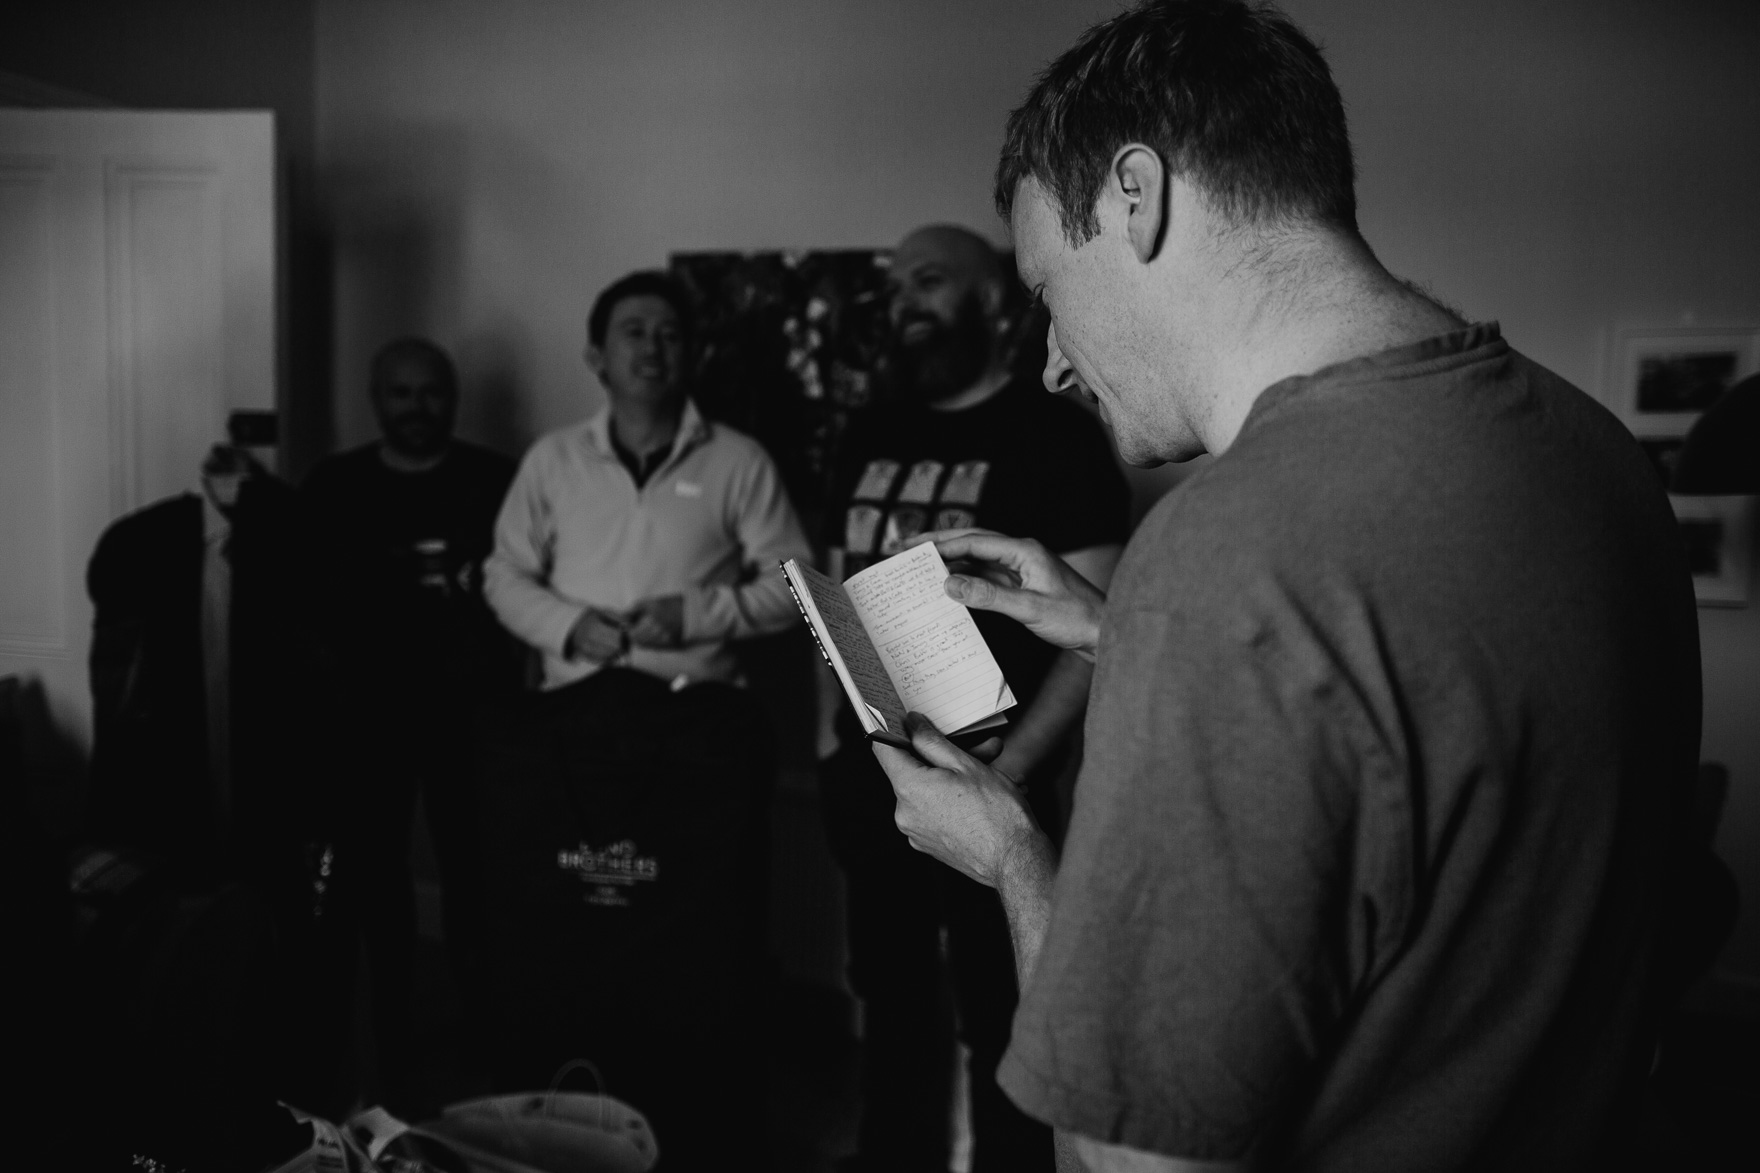 A man holding a laptop